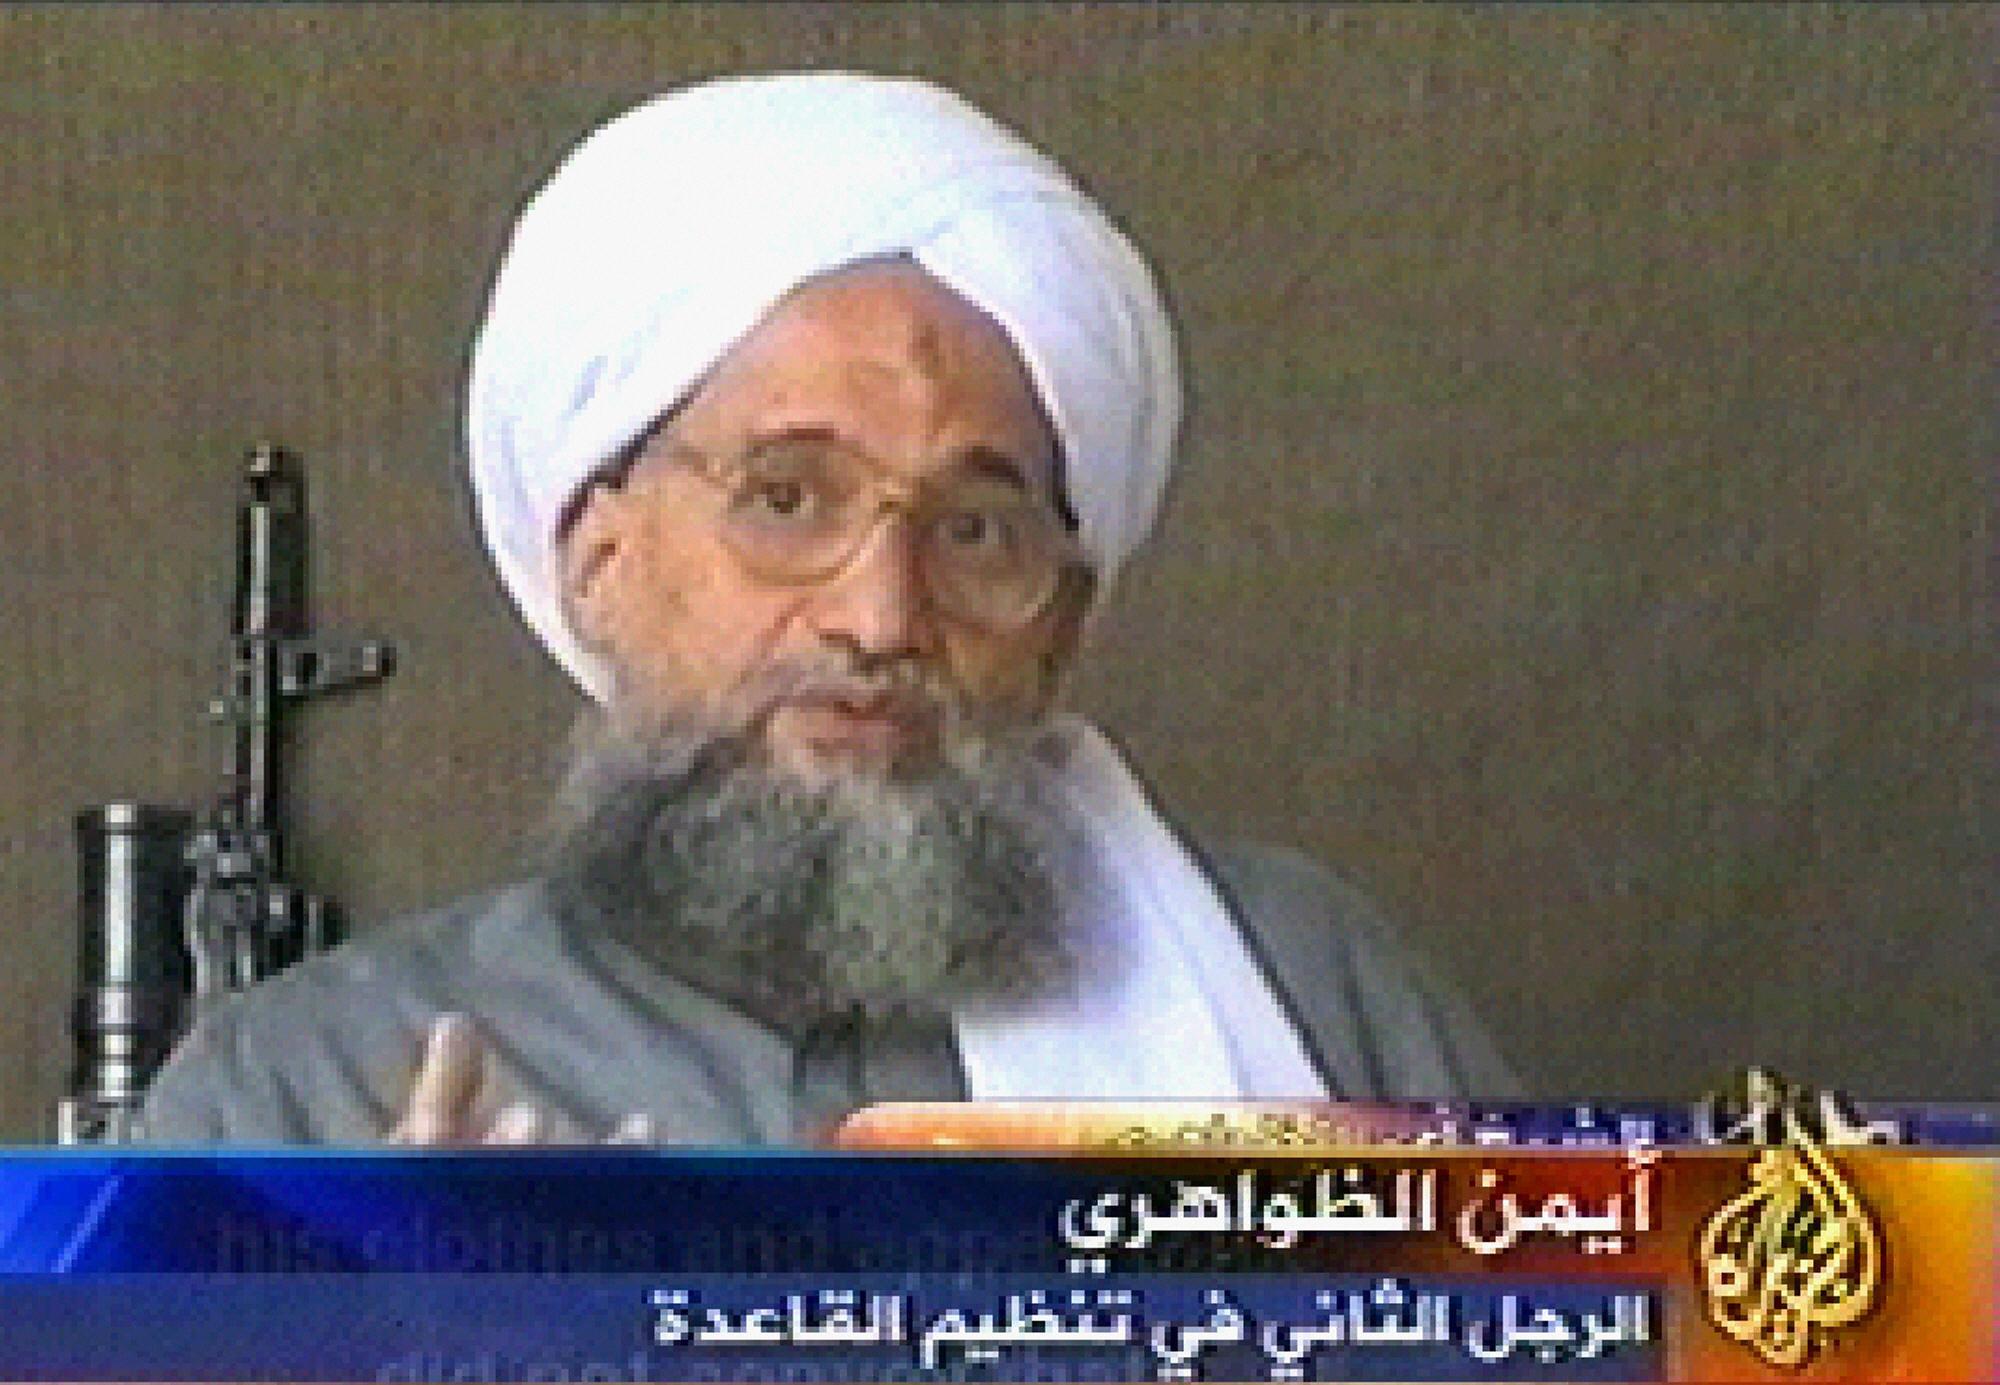 A video grab taken 06 July 2006 from the pan-Arab satellite television network al-Jazeera shows al-Qaeda second-in-command Ayman al-Zawahri. (AFP via Getty Images)